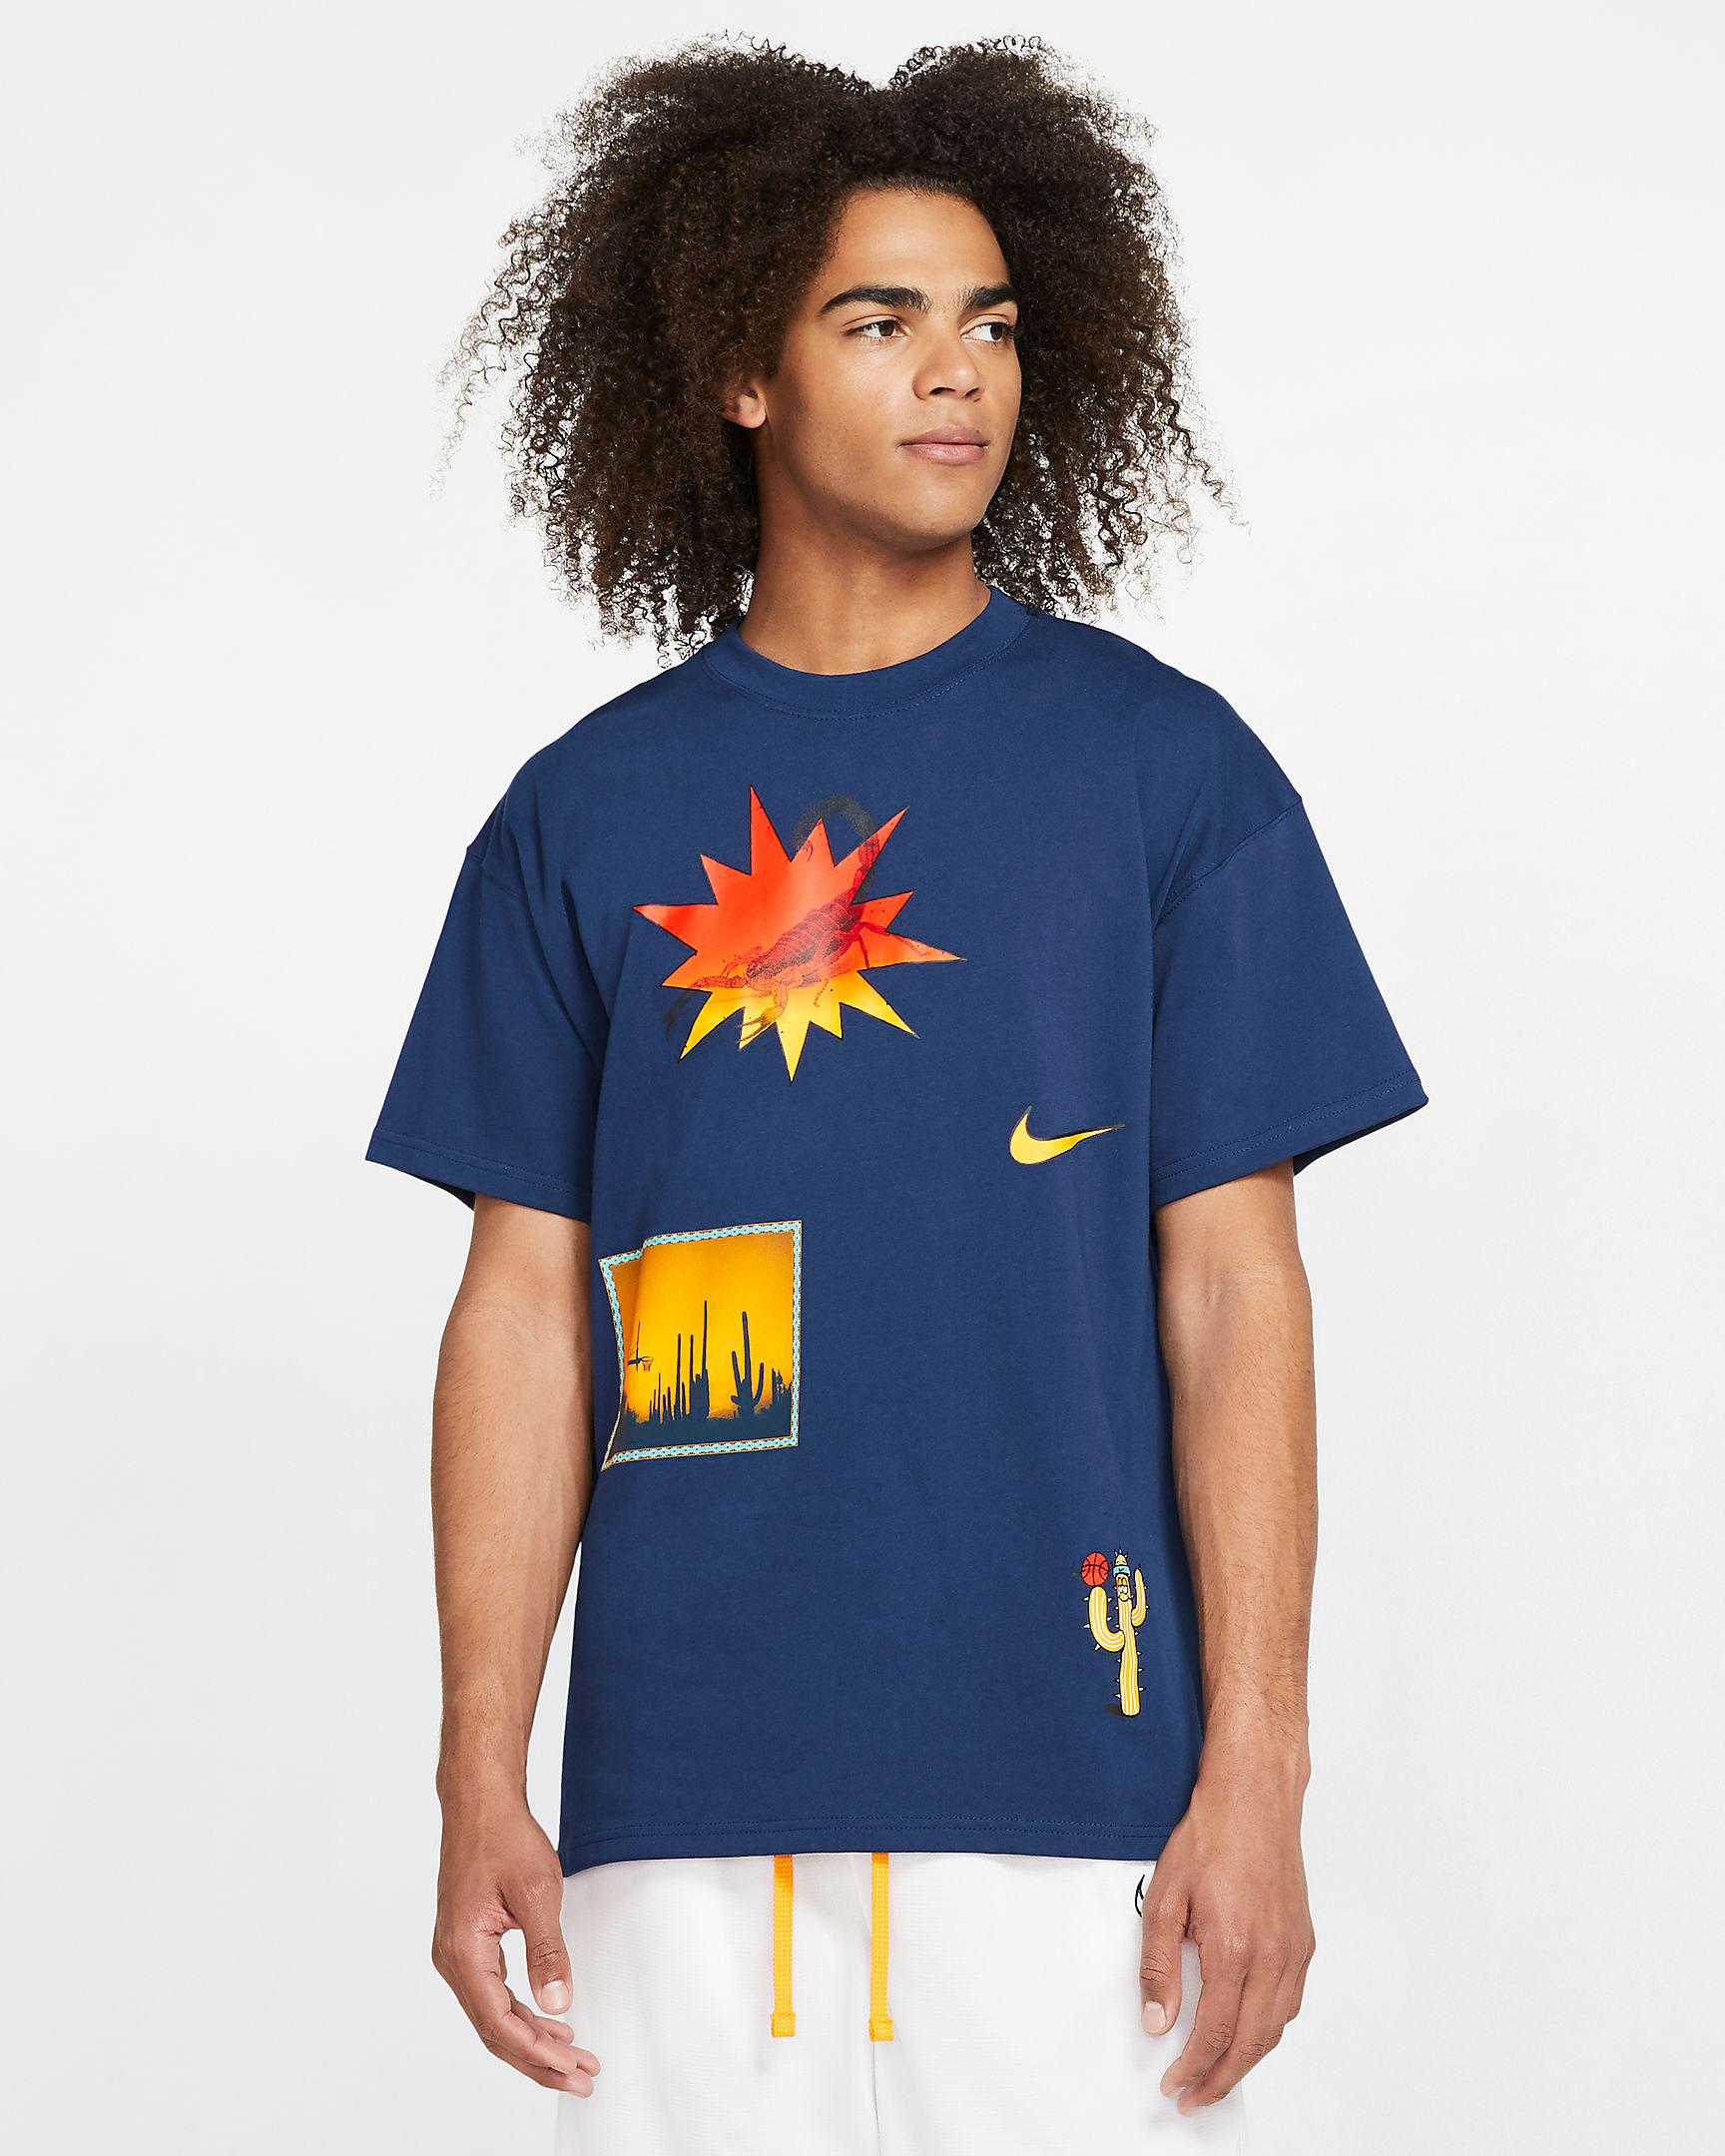 nike-foamposite-rugged-orange-shirt-match-1